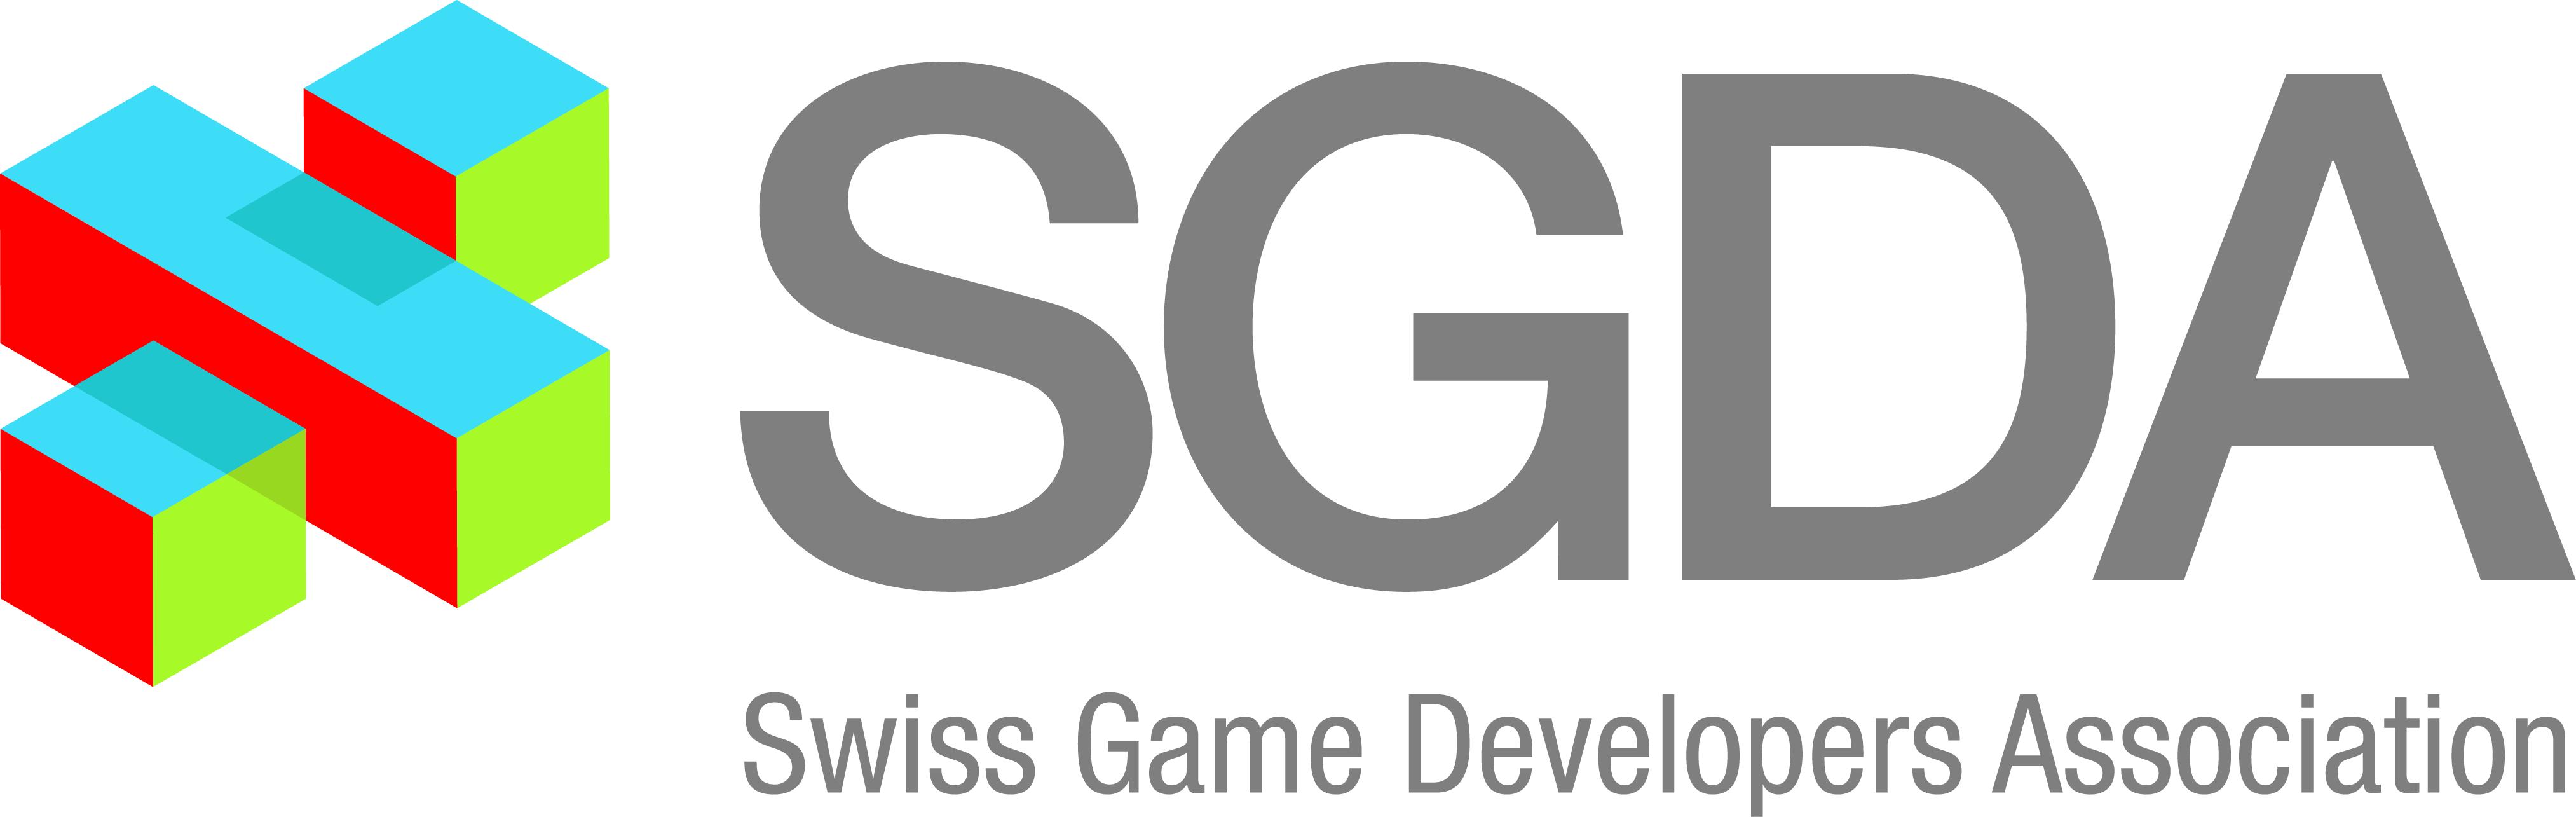 imgawards-sgda-partner